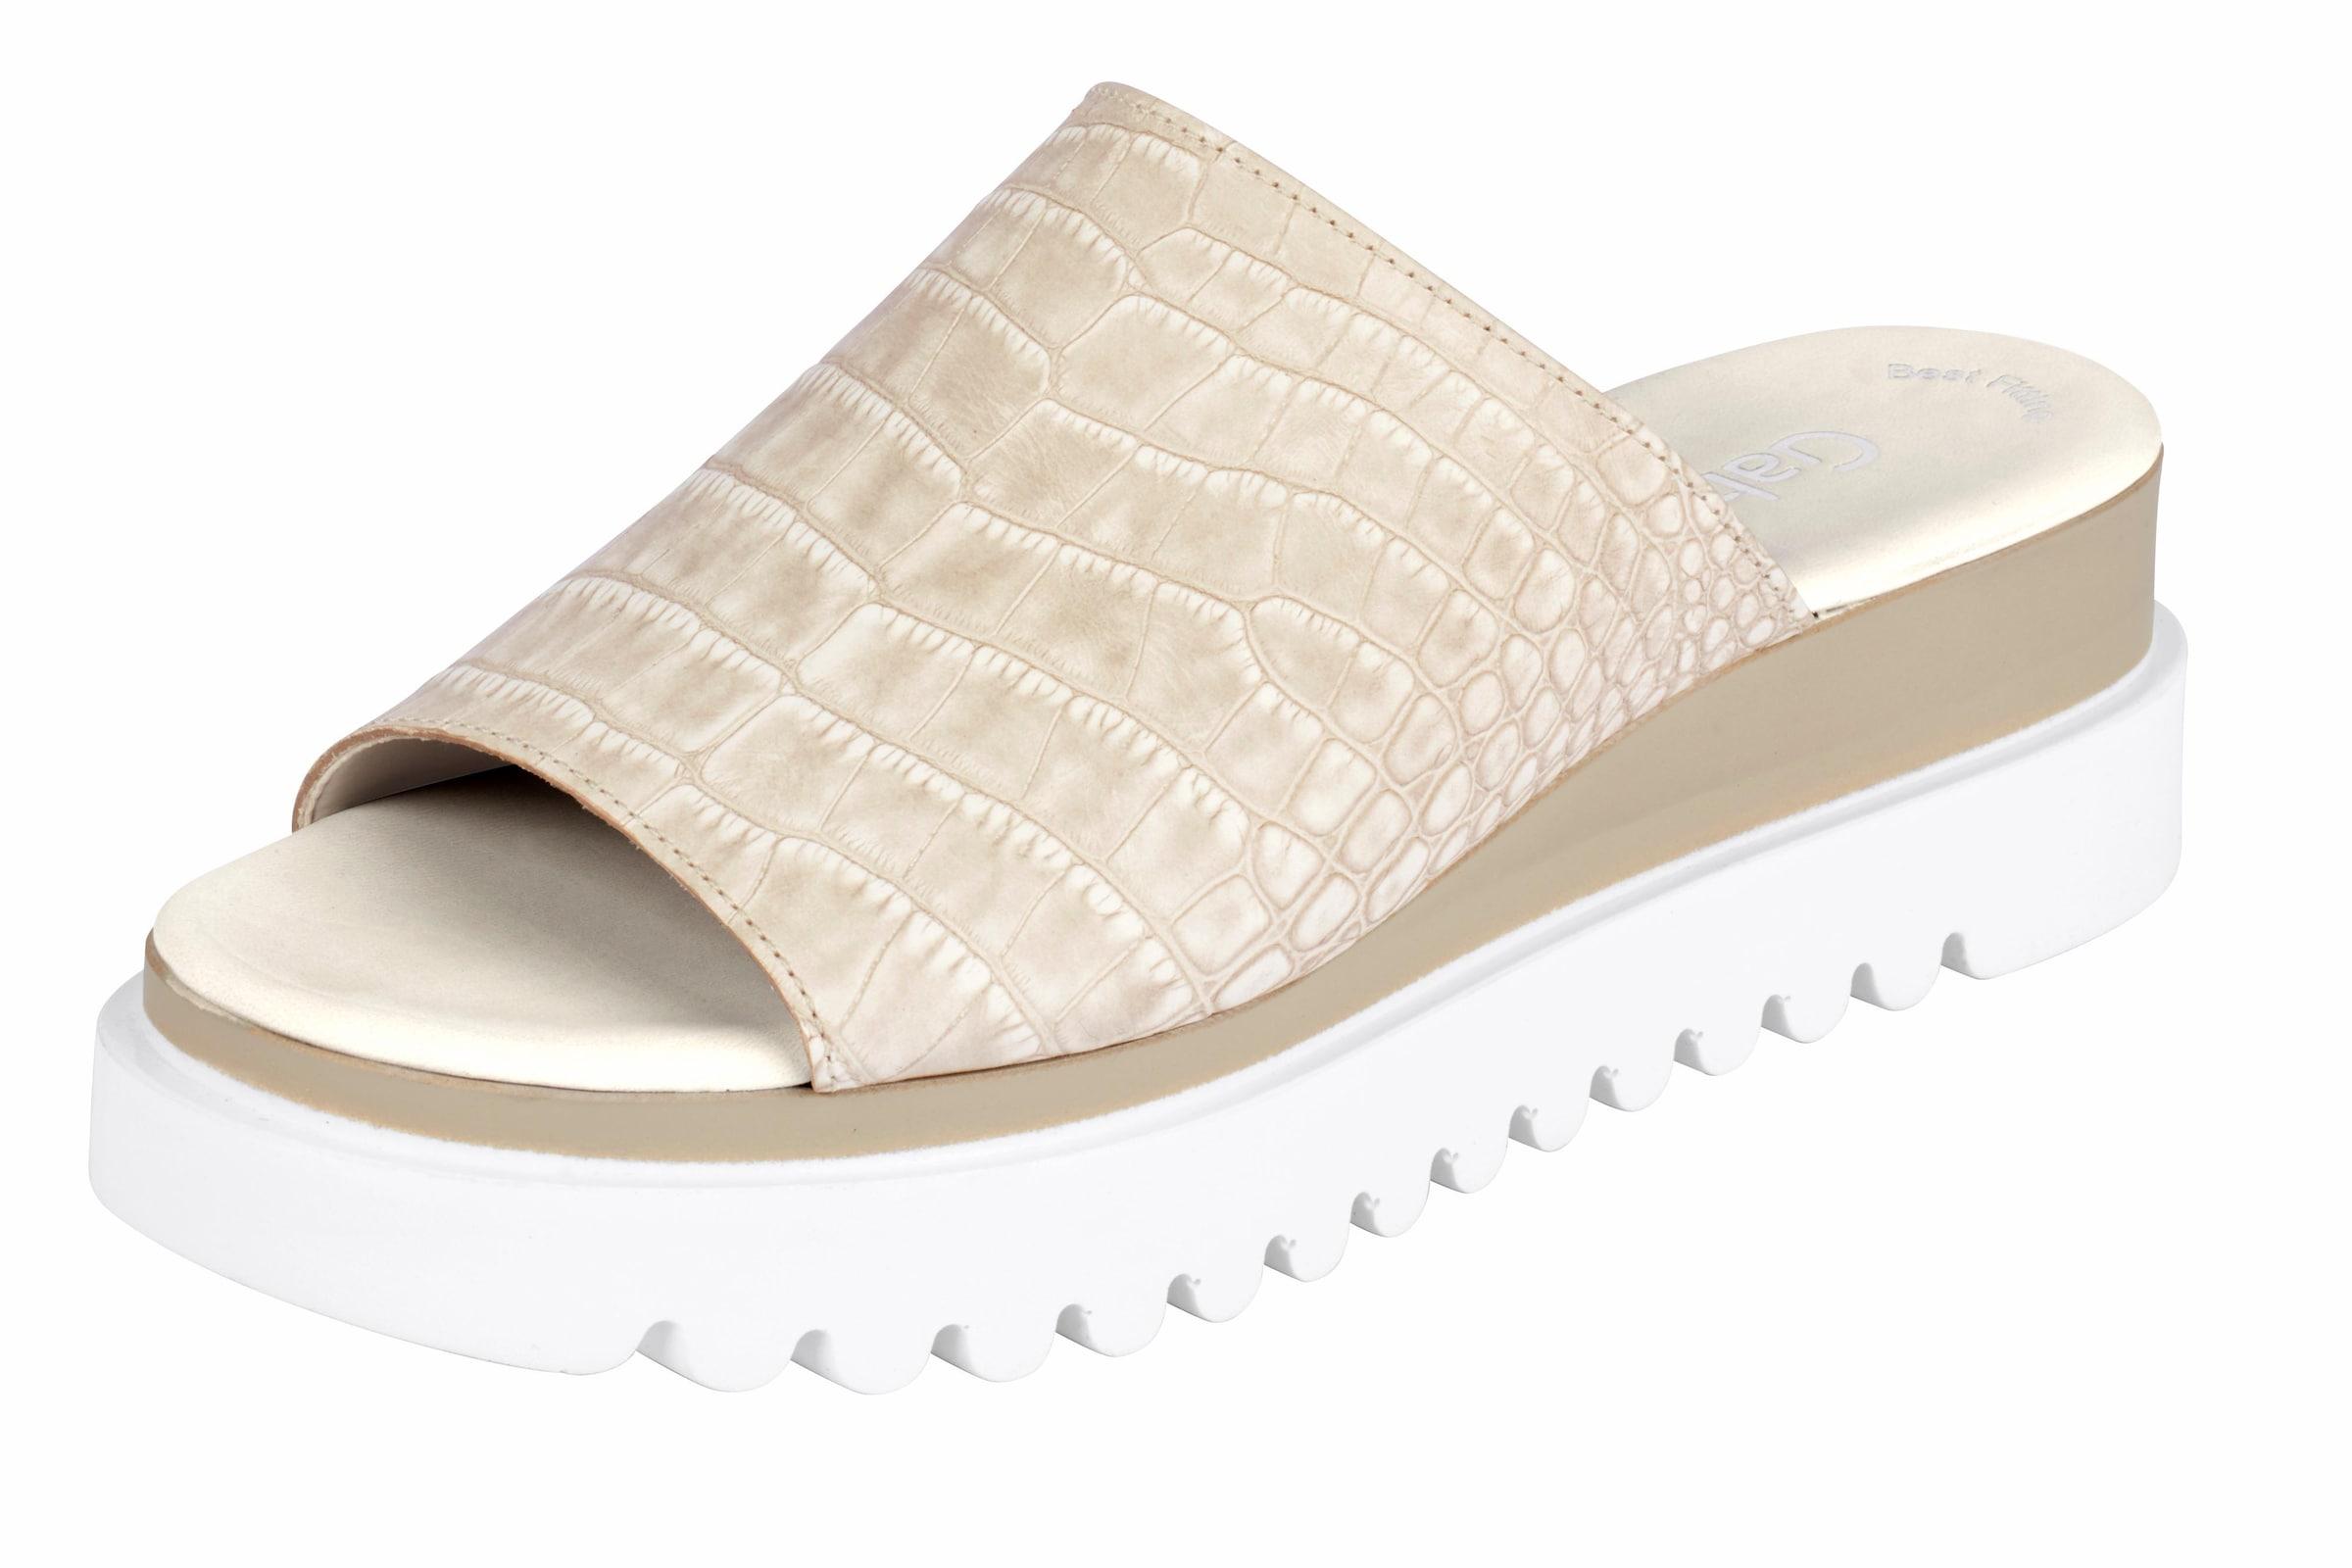 GABOR Pantolette mit Plateau-Sohle Günstige und langlebige Schuhe